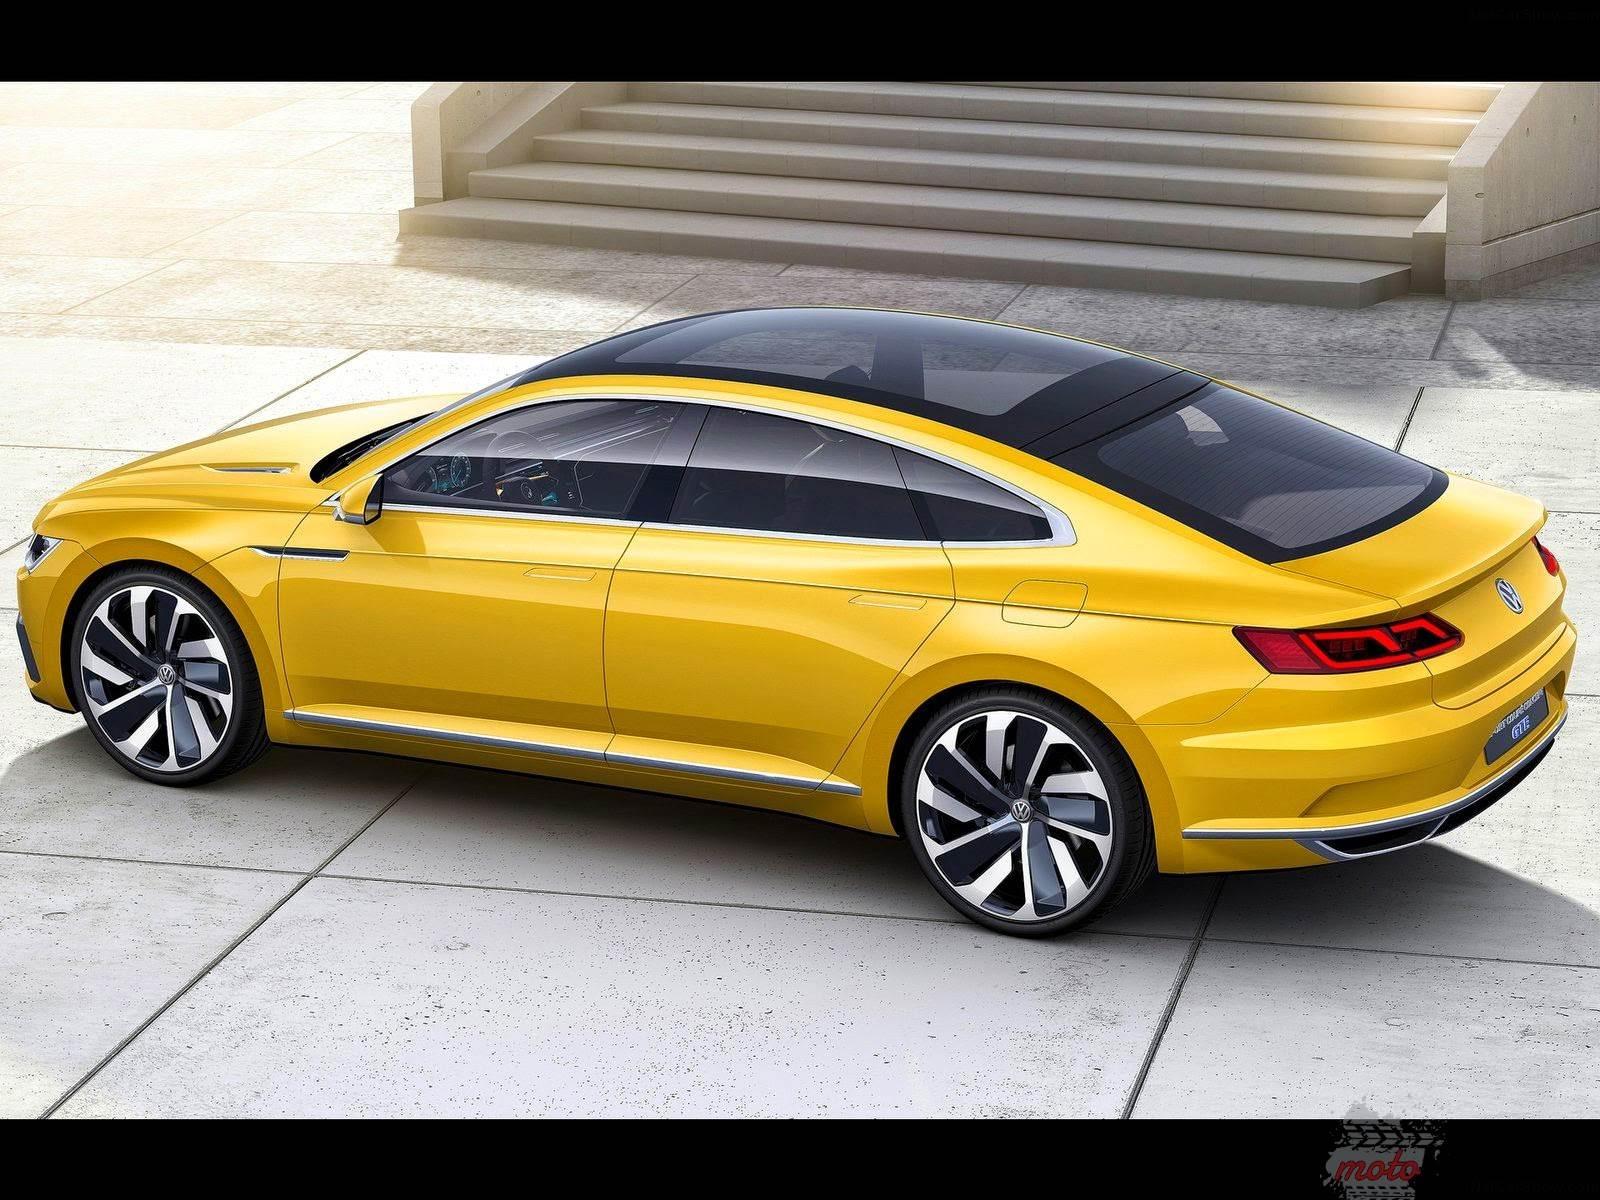 2015 Volkswagen Sport Coupe GTE Concept 2 [Genewa 2015] Volkswagen Sport Coupe GTE Concept   Passat CC?